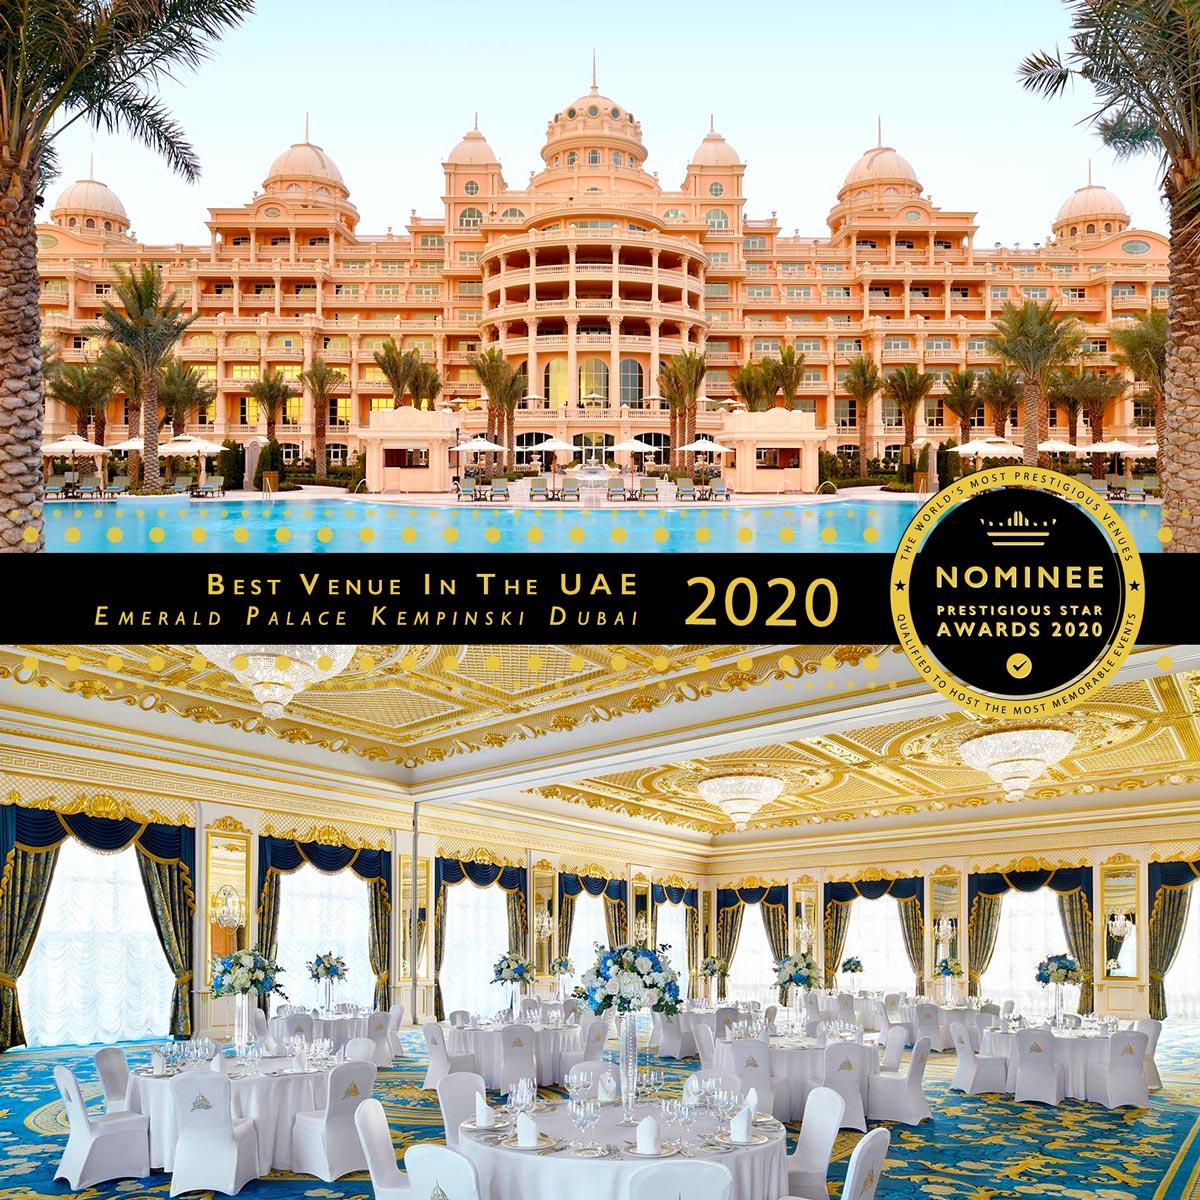 Grand Salon Maximilian' Ballroom at Emerald Palace Kempinski Dubai